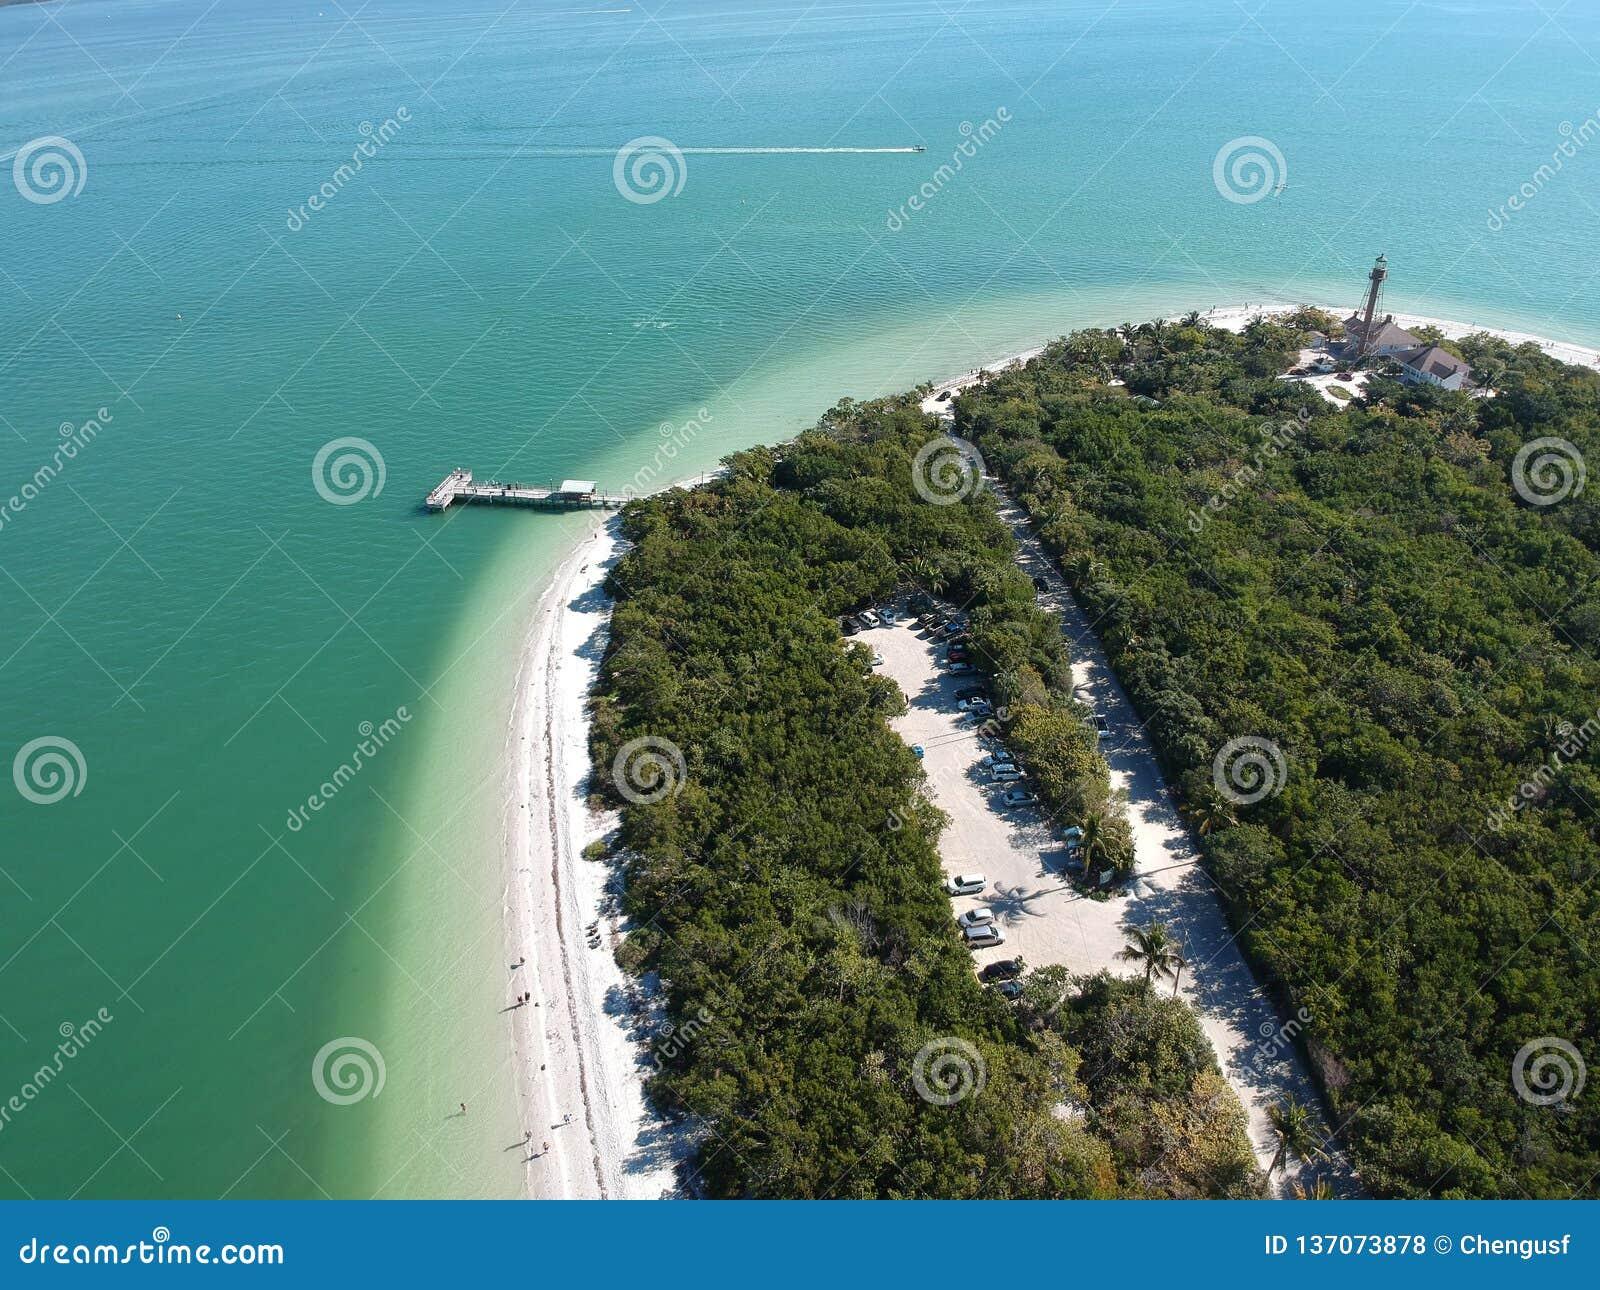 Aerial view of Sanibel beach